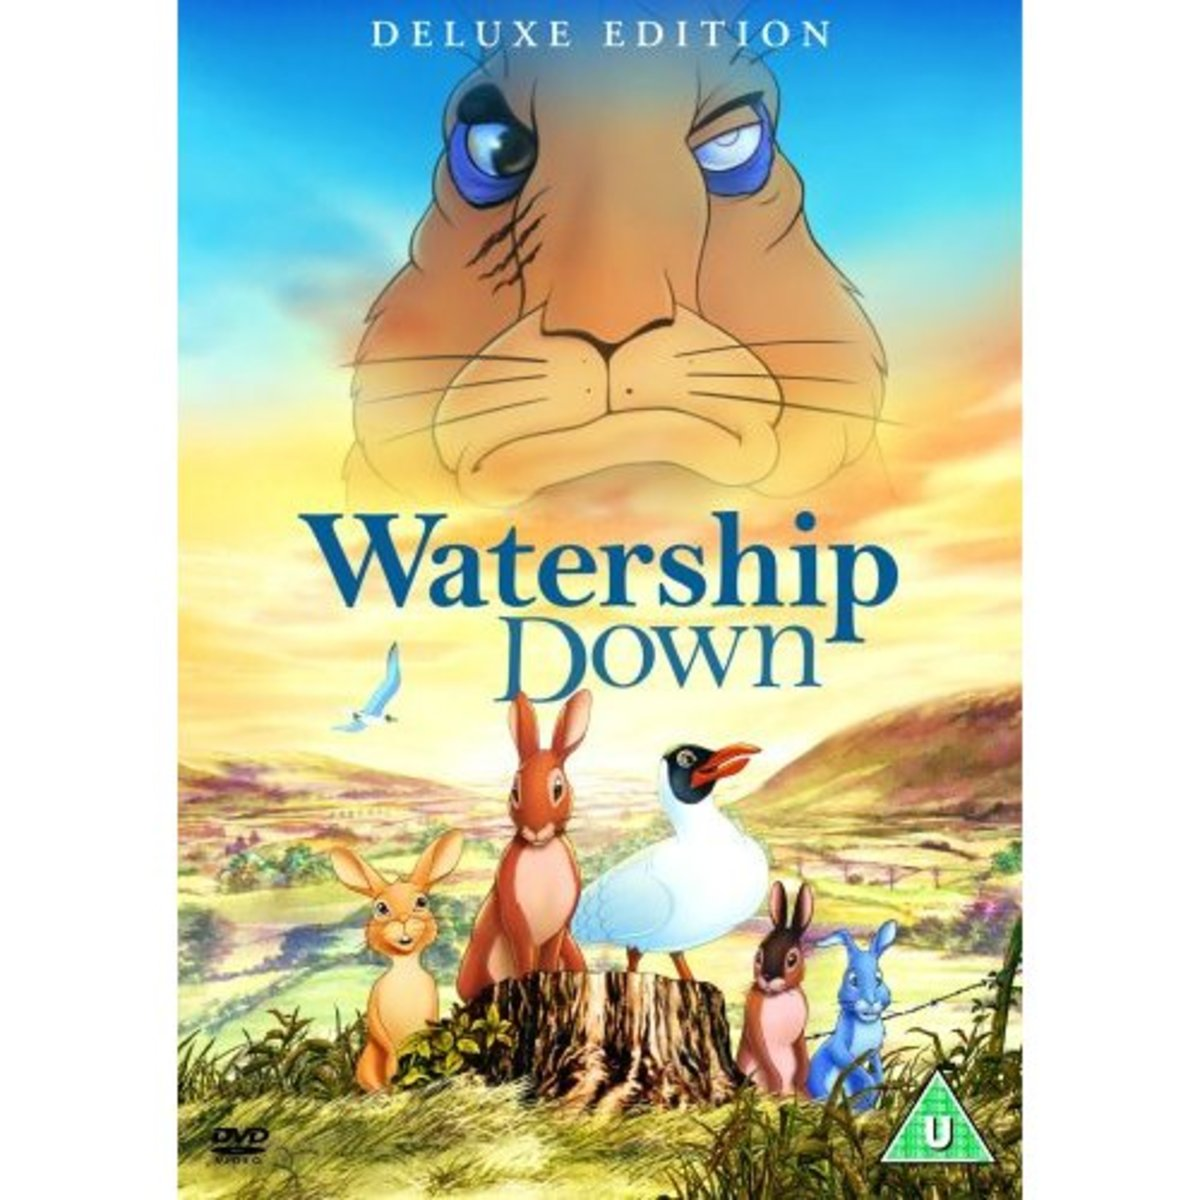 Watership down essay